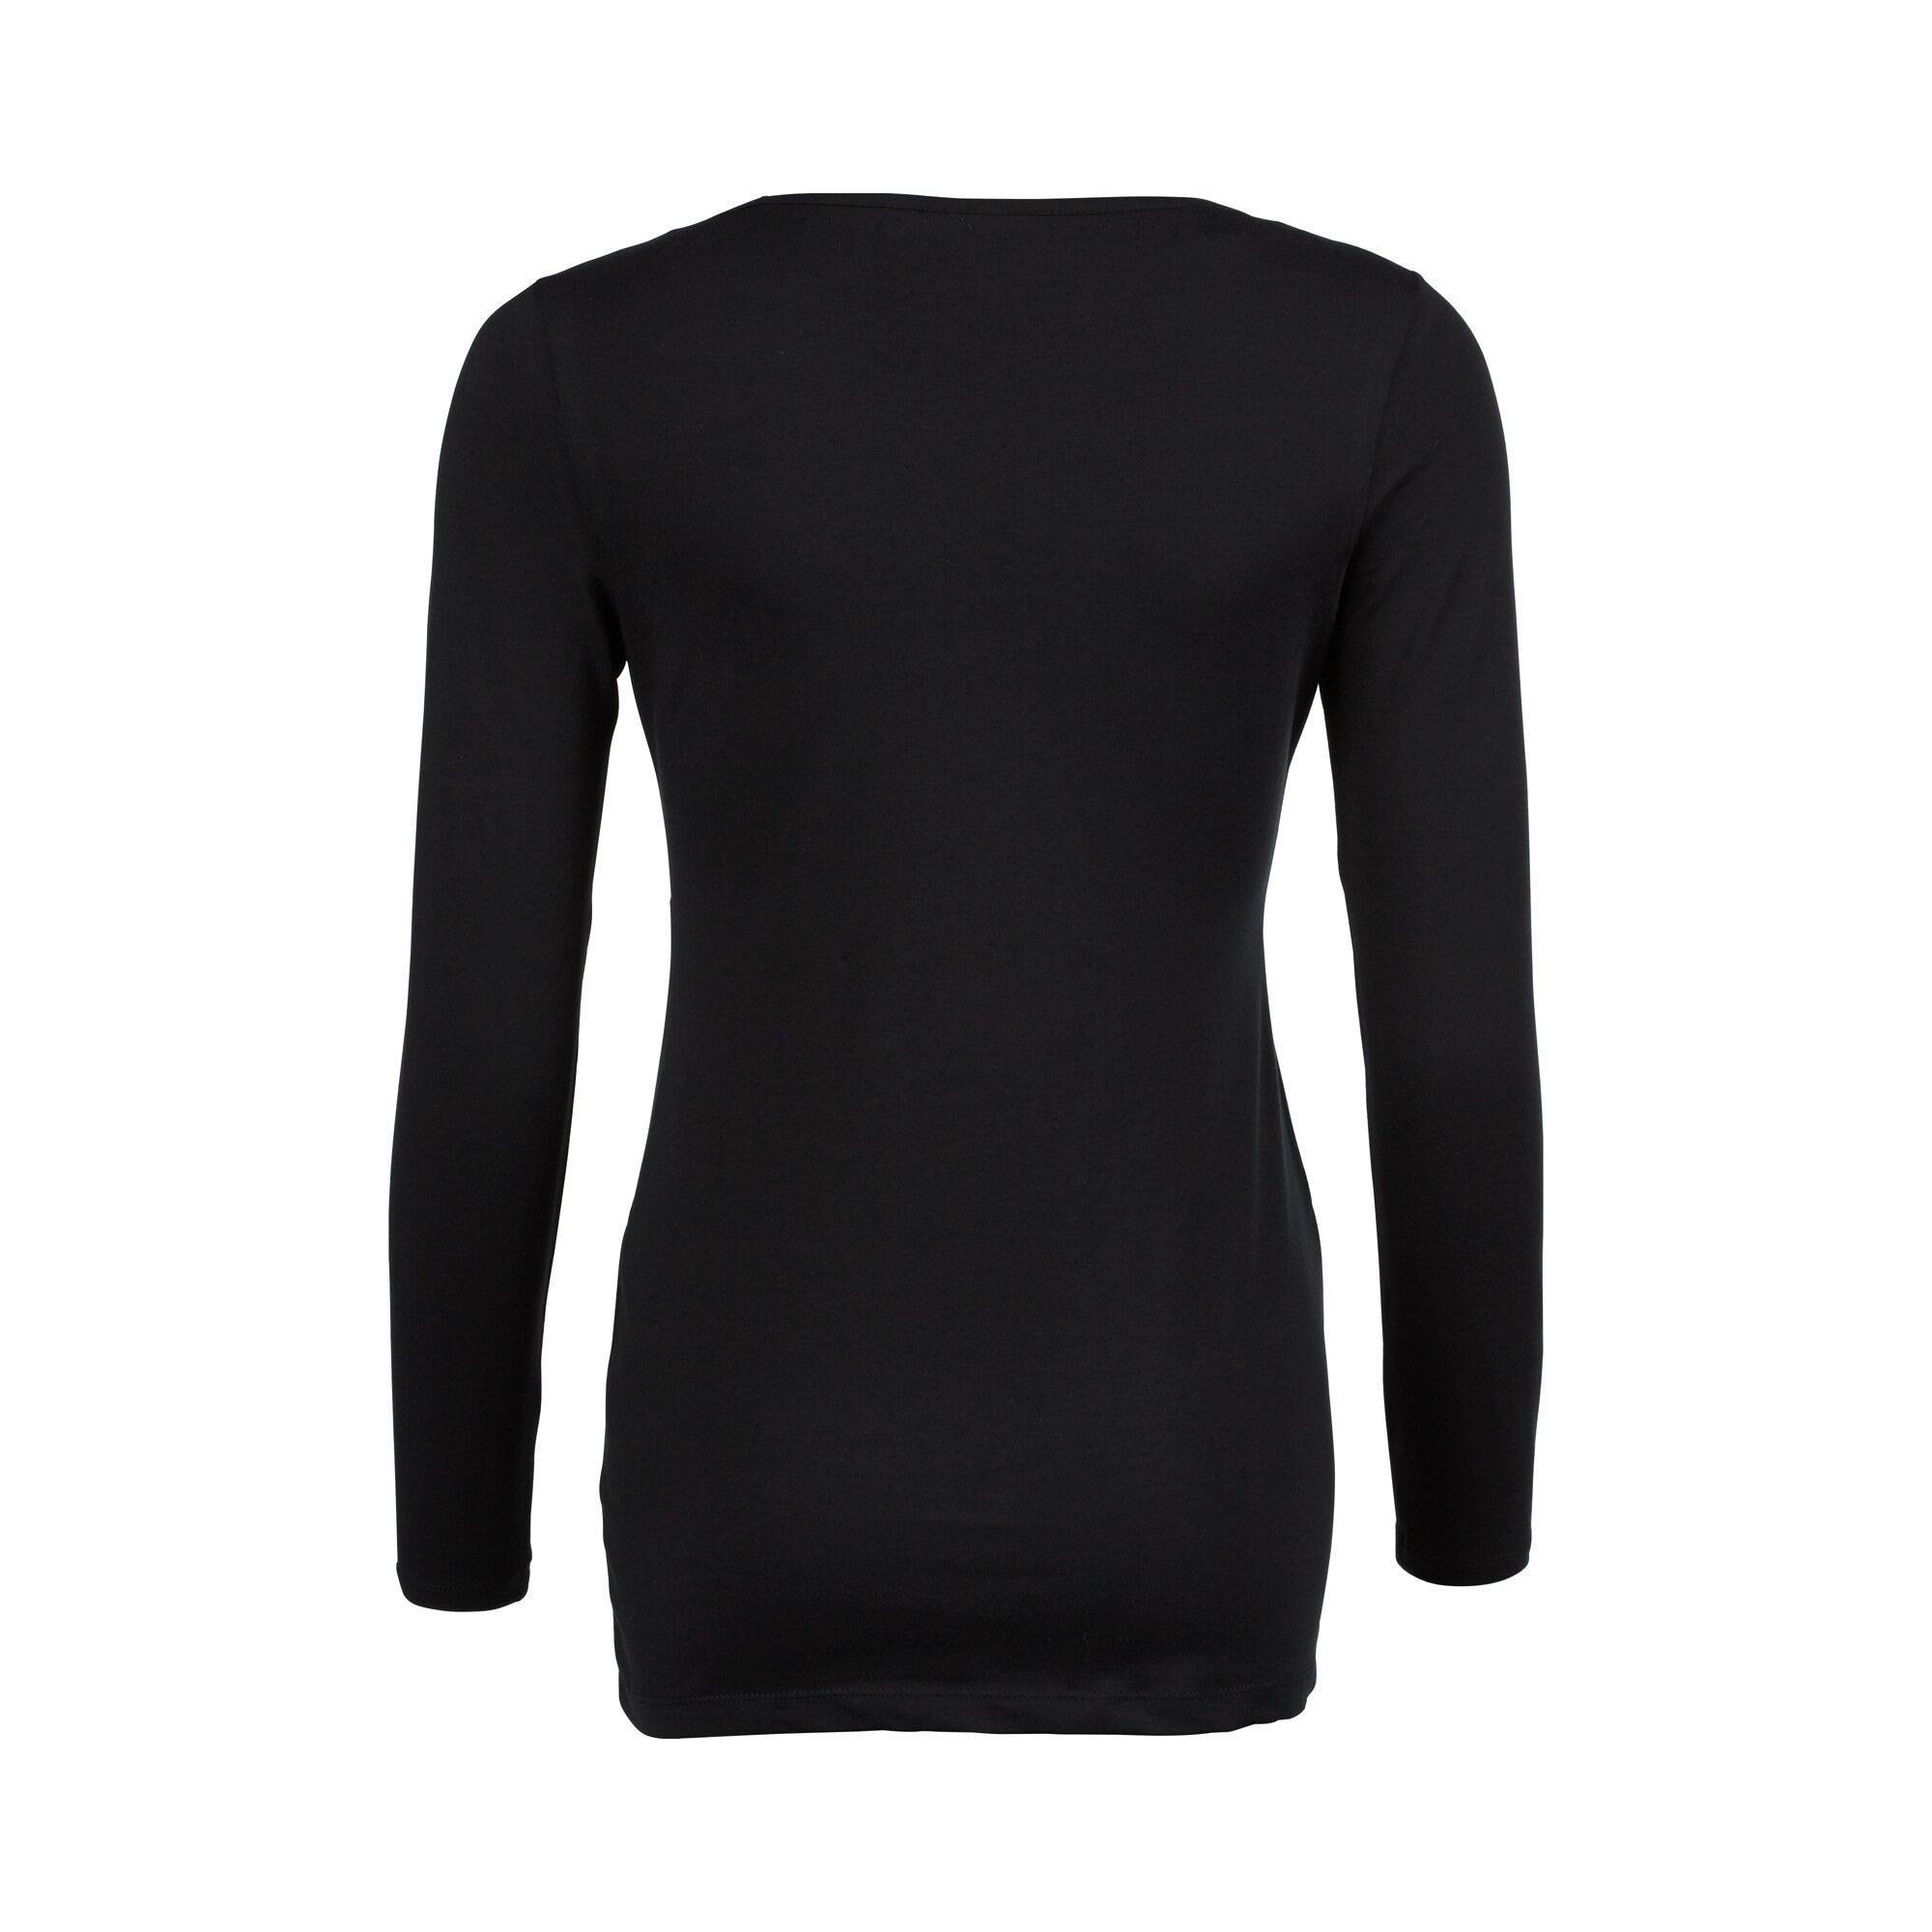 2hearts-still-shirt-langarm-schwarz-36-38-40-42-44-46